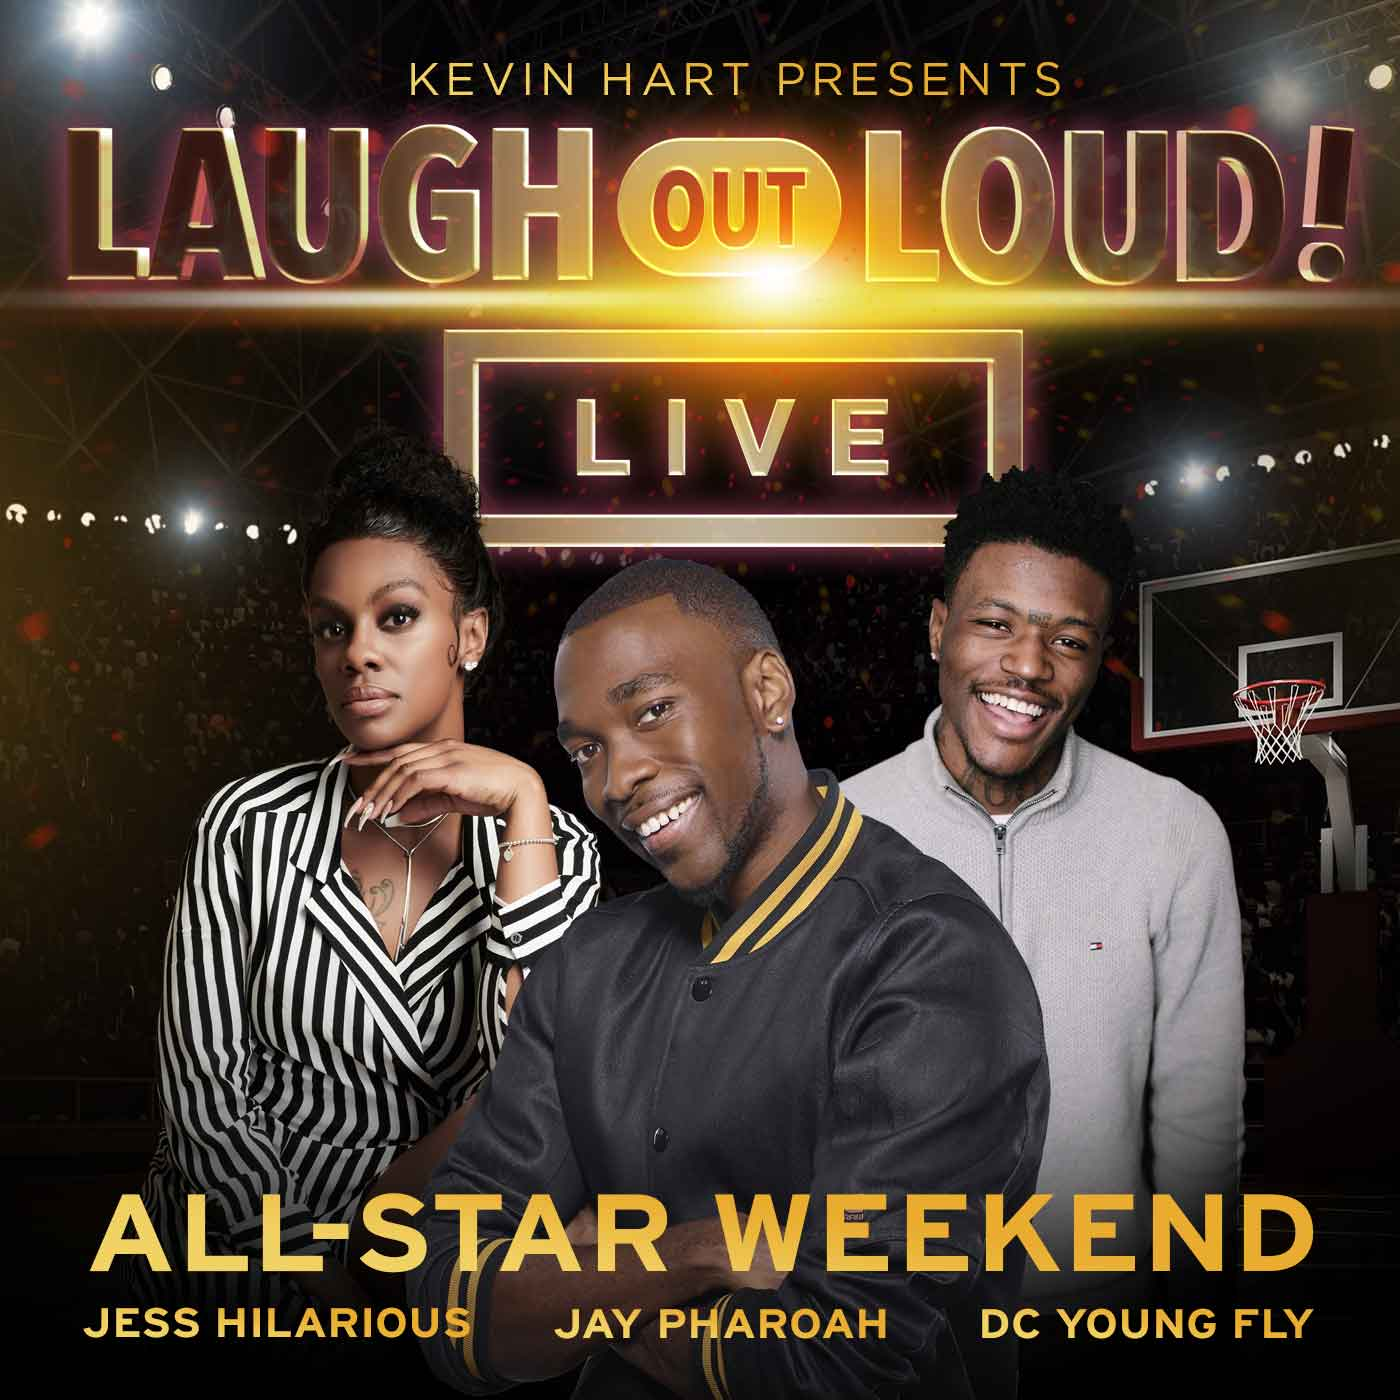 Kevin Hart Presents: Laugh Out Loud Live